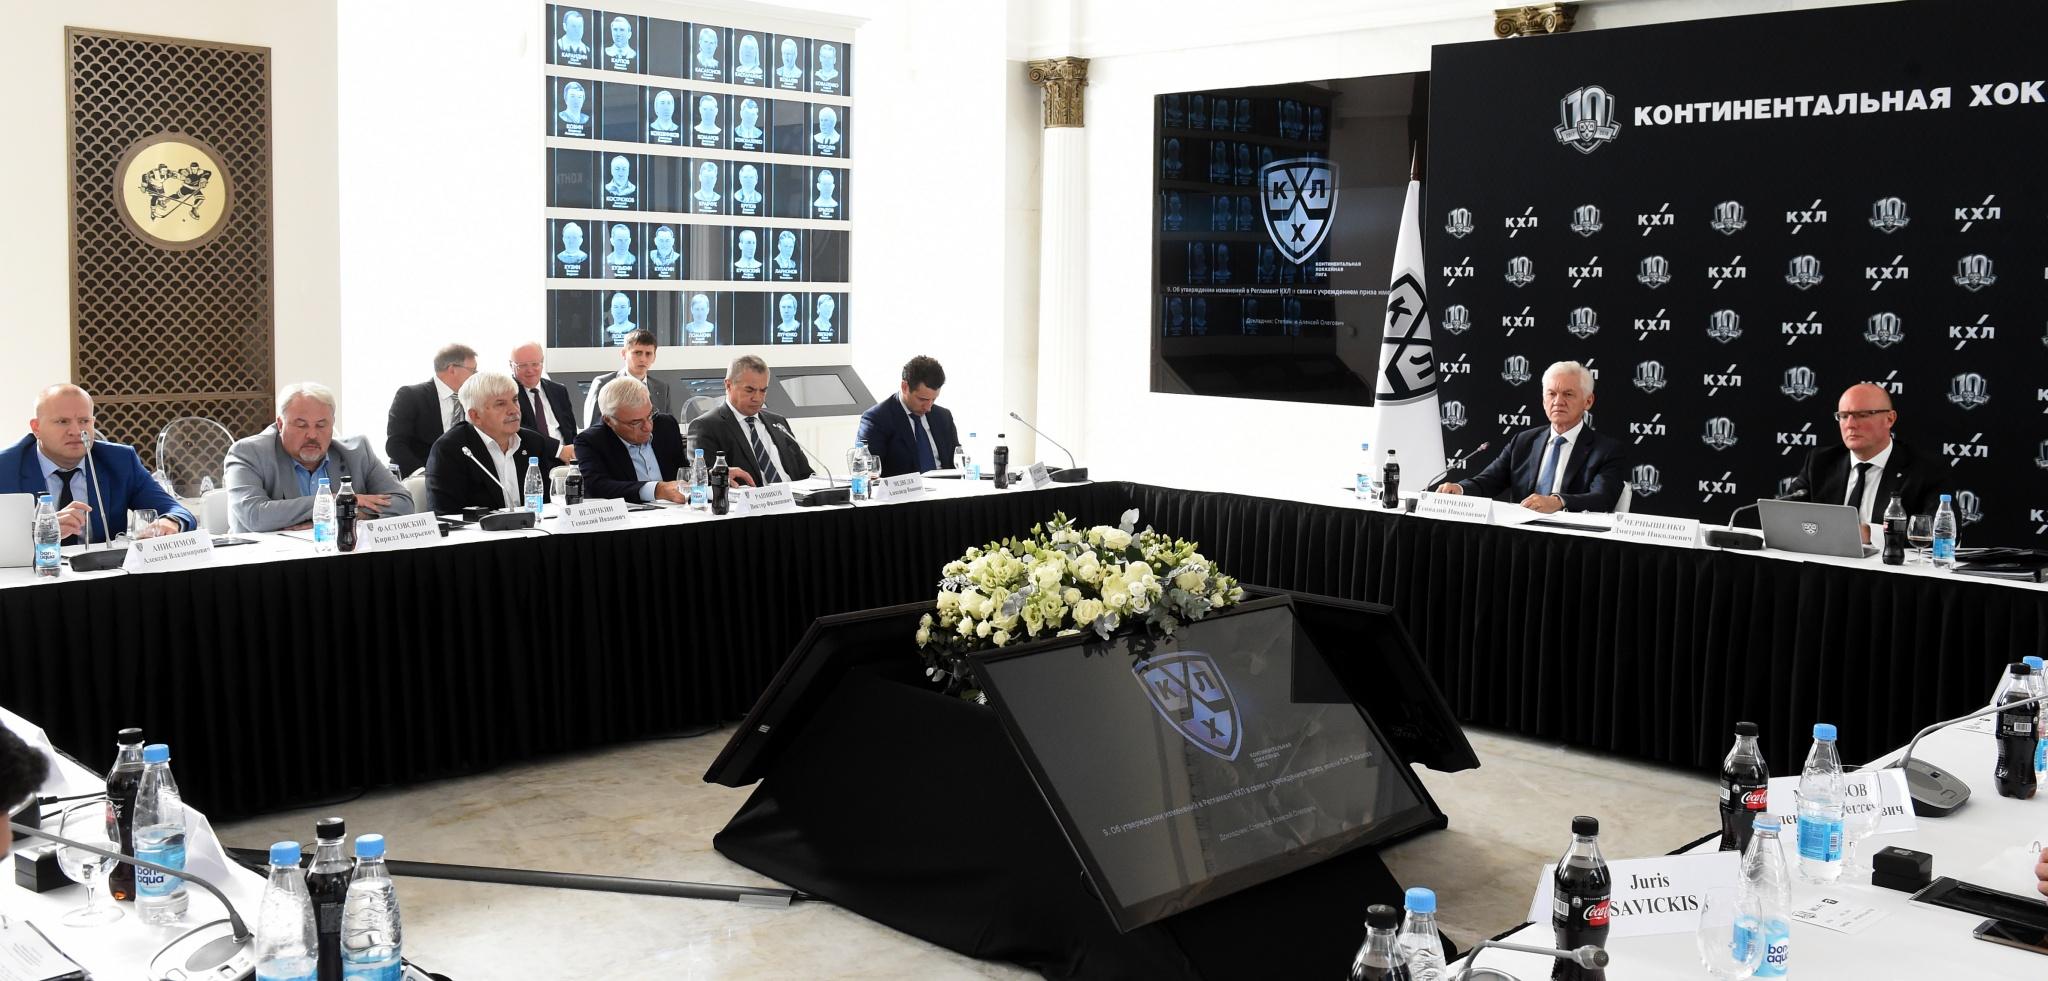 03_20170915_KHL_VNB 4.jpg